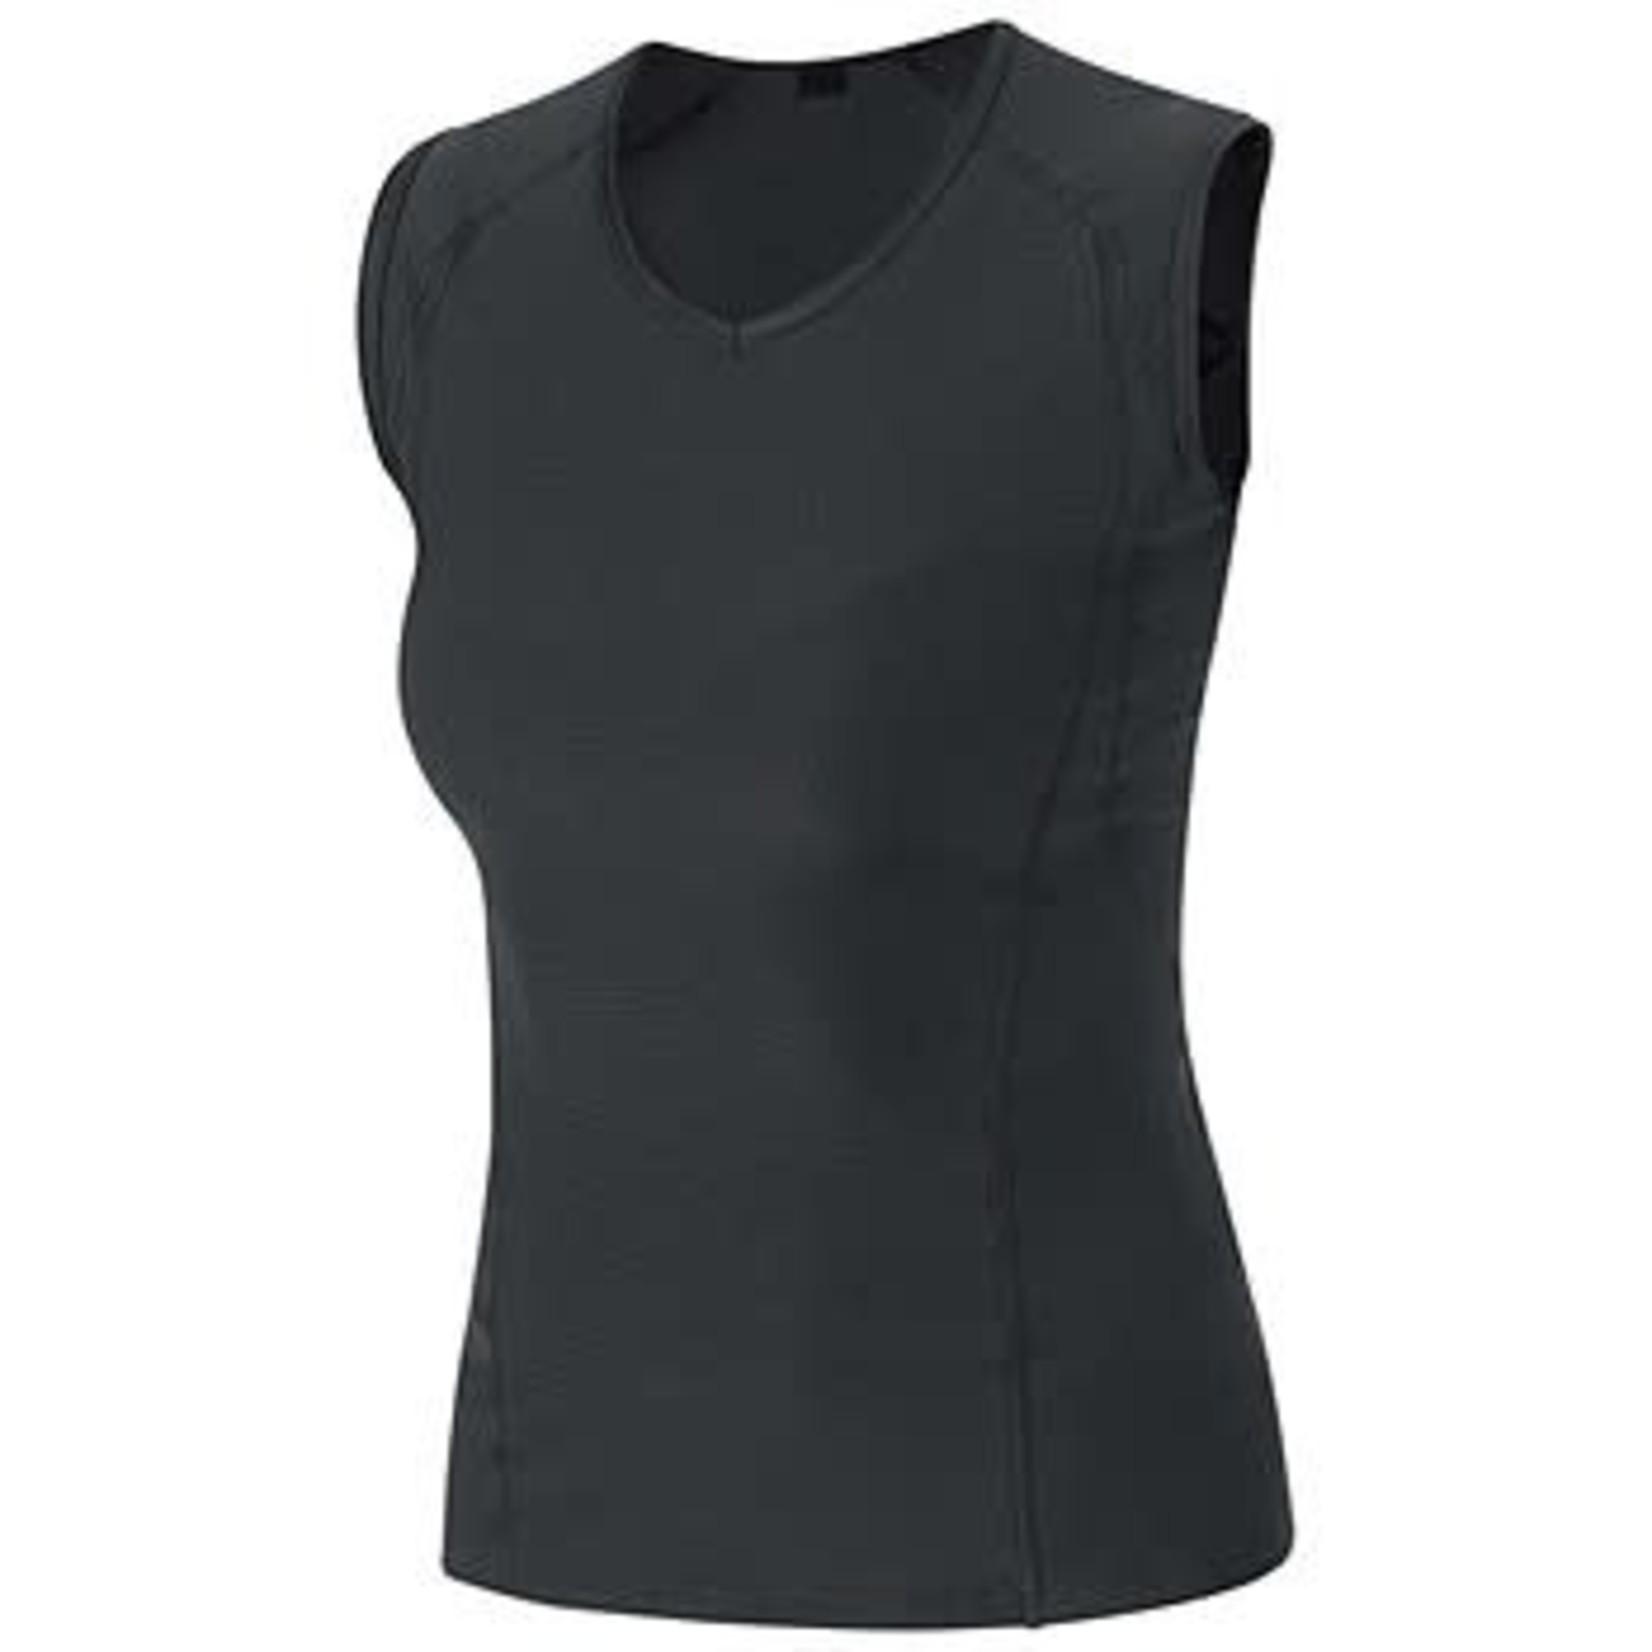 GORE Wear GORE M Wmn GWS BL Sleeveless Shirt black 36